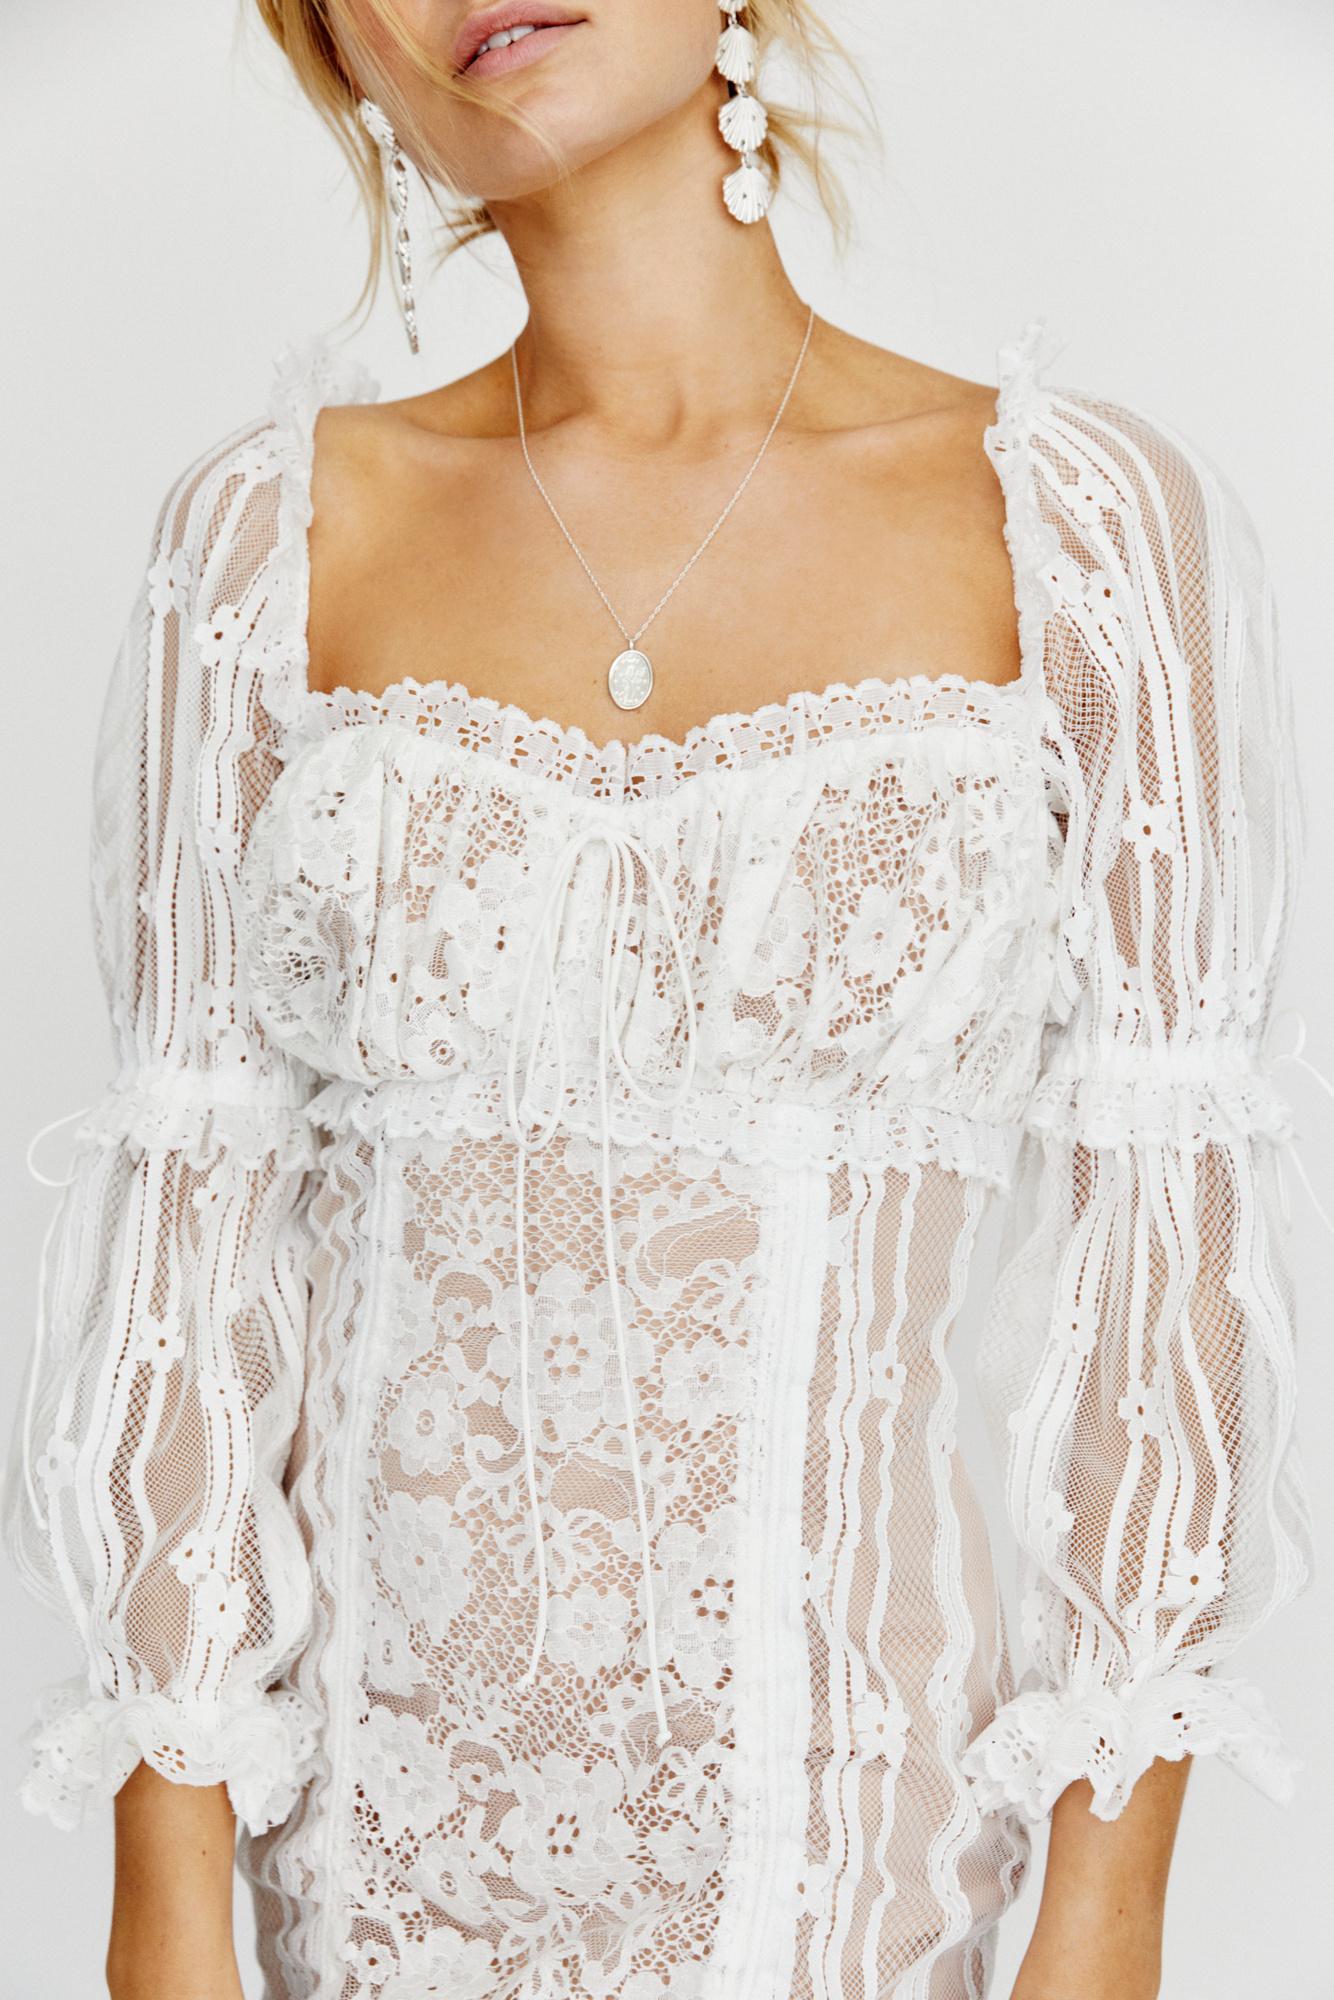 6dd937533b99 ... Monroe Mini Dress By For Love & Lemons - Lyst. View fullscreen